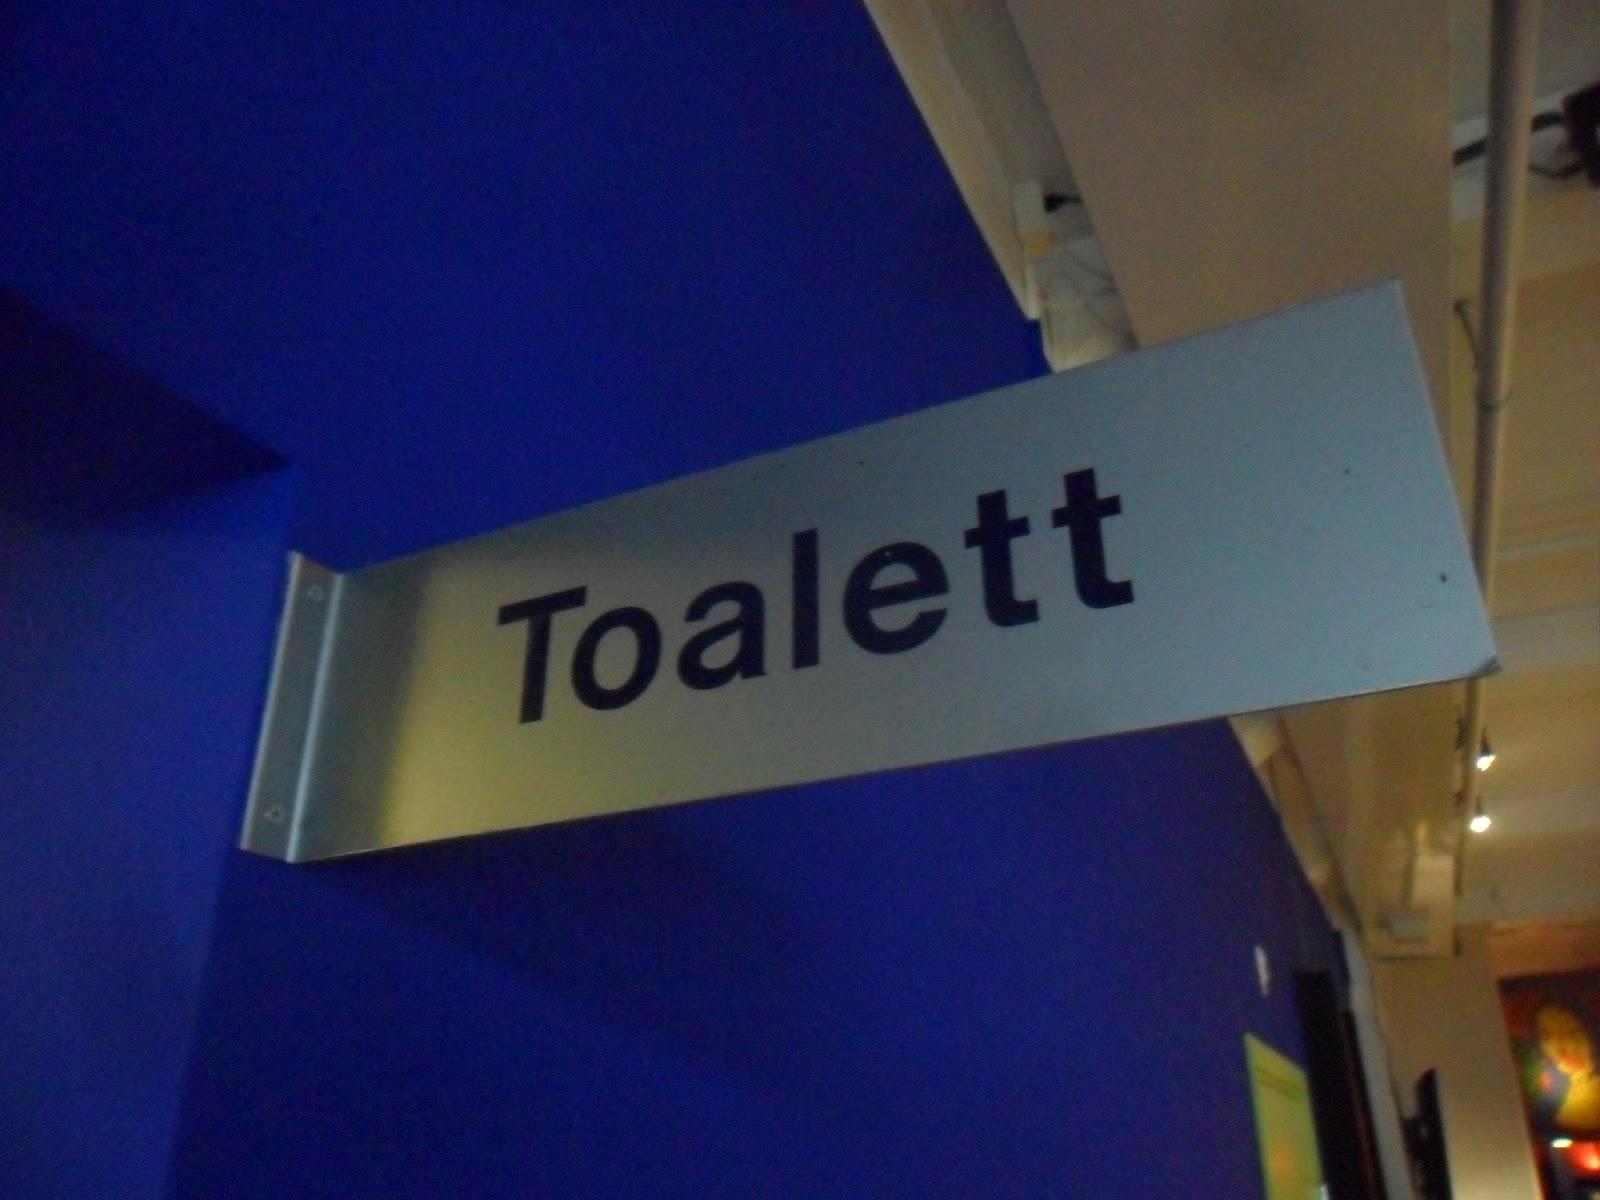 ... skylt skylten skyltar toa toalett wc vc toaletter dass hänvisning